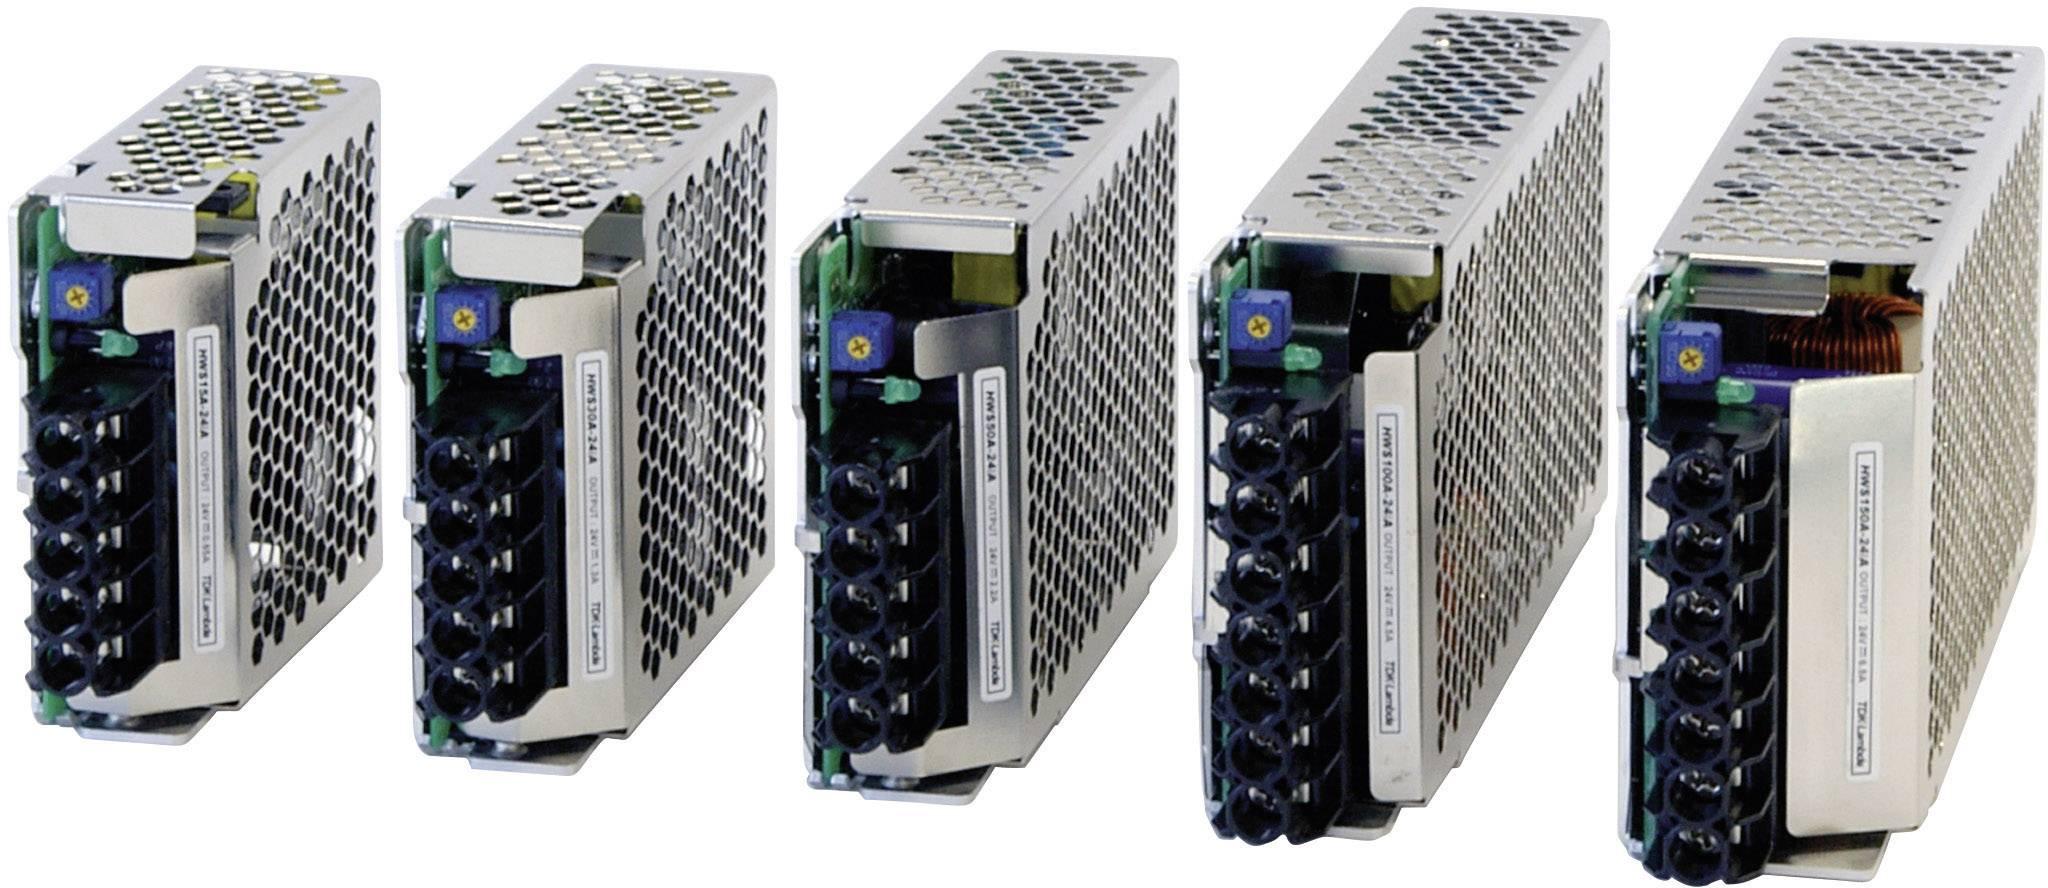 Zabudovateľný napájací zdroj TDK-Lambda HWS-30-24/A, 24 V, 31,2 W